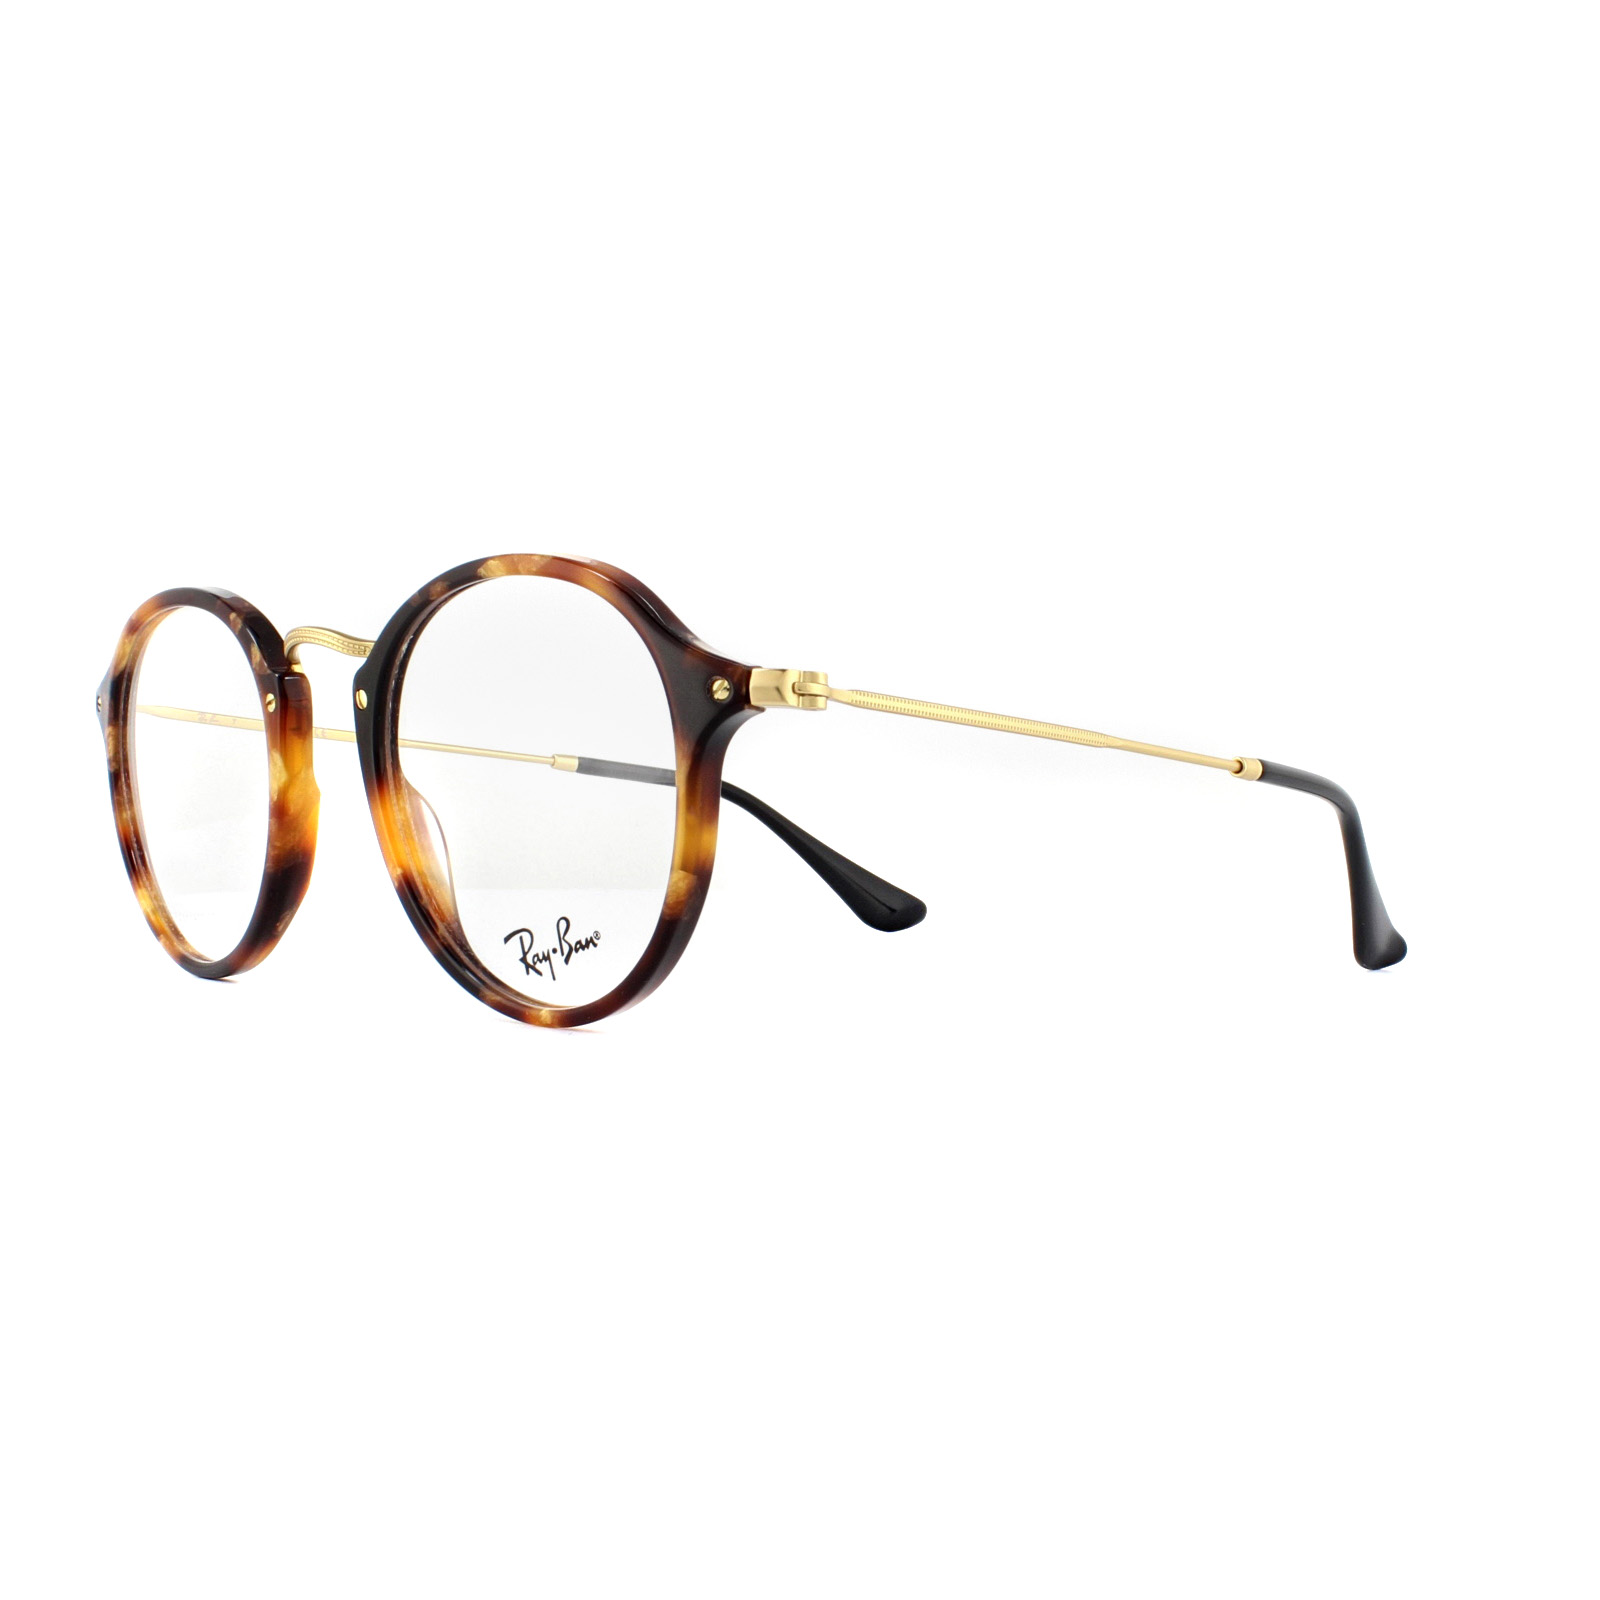 64b637544a52a Sentinel Ray-Ban Glasses Frames 2447V 5494 Havana Gold 49mm. Sentinel  Thumbnail 2